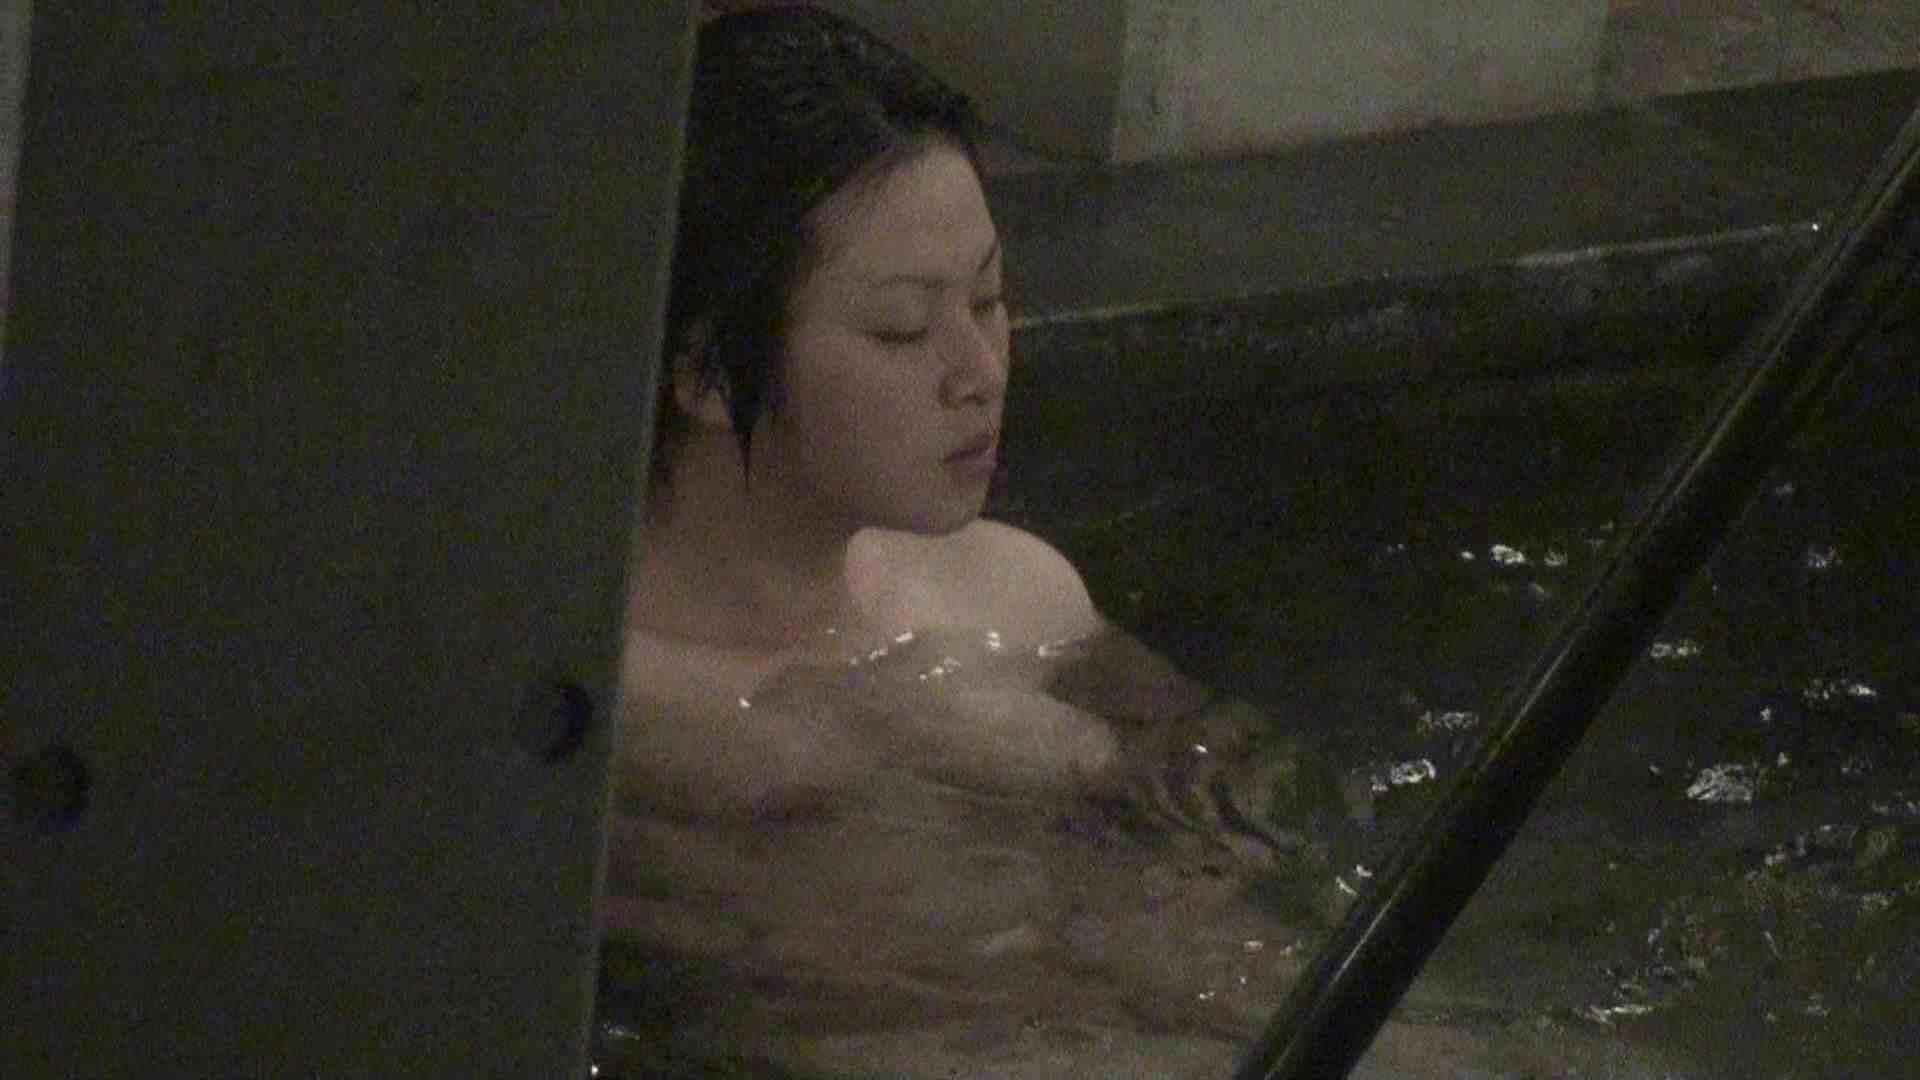 Aquaな露天風呂Vol.338 露天風呂編 | 盗撮シリーズ  82PIX 75